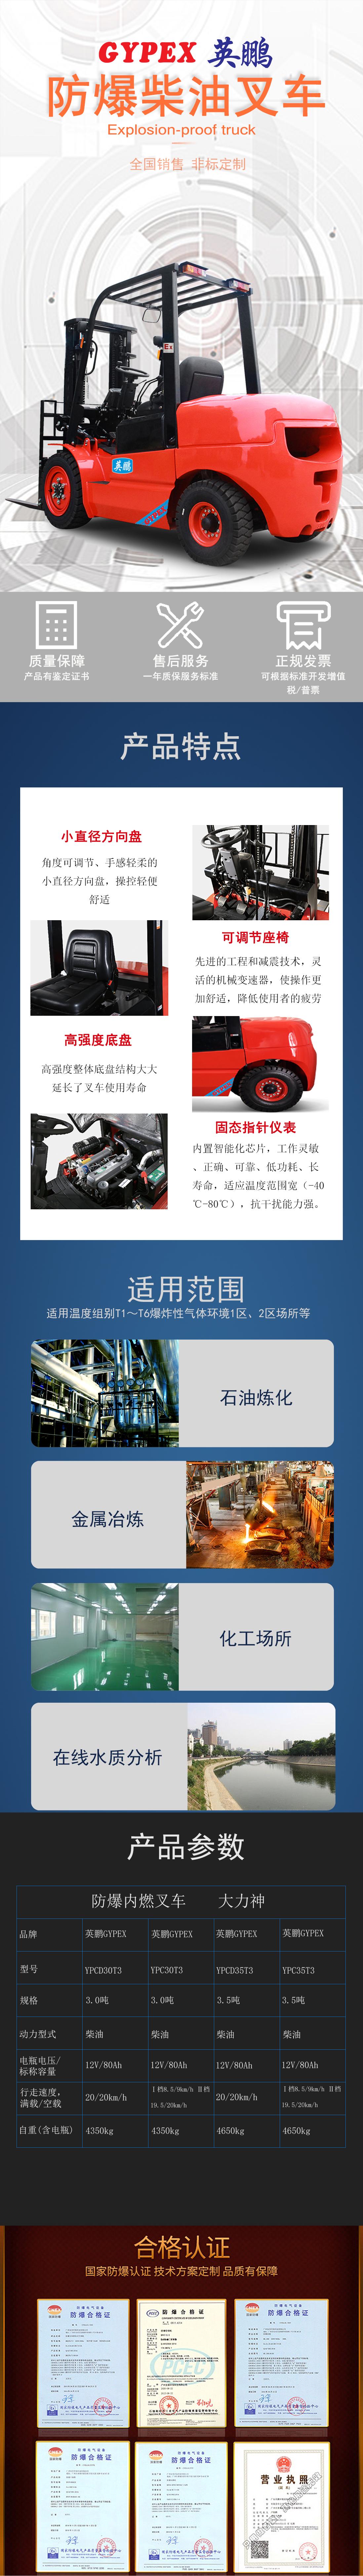 YPCD30T3(大力神)  YPC30T3(大力神)YPCD35T3(大力神)  YPC35T3(大力神)詳情圖.jpg